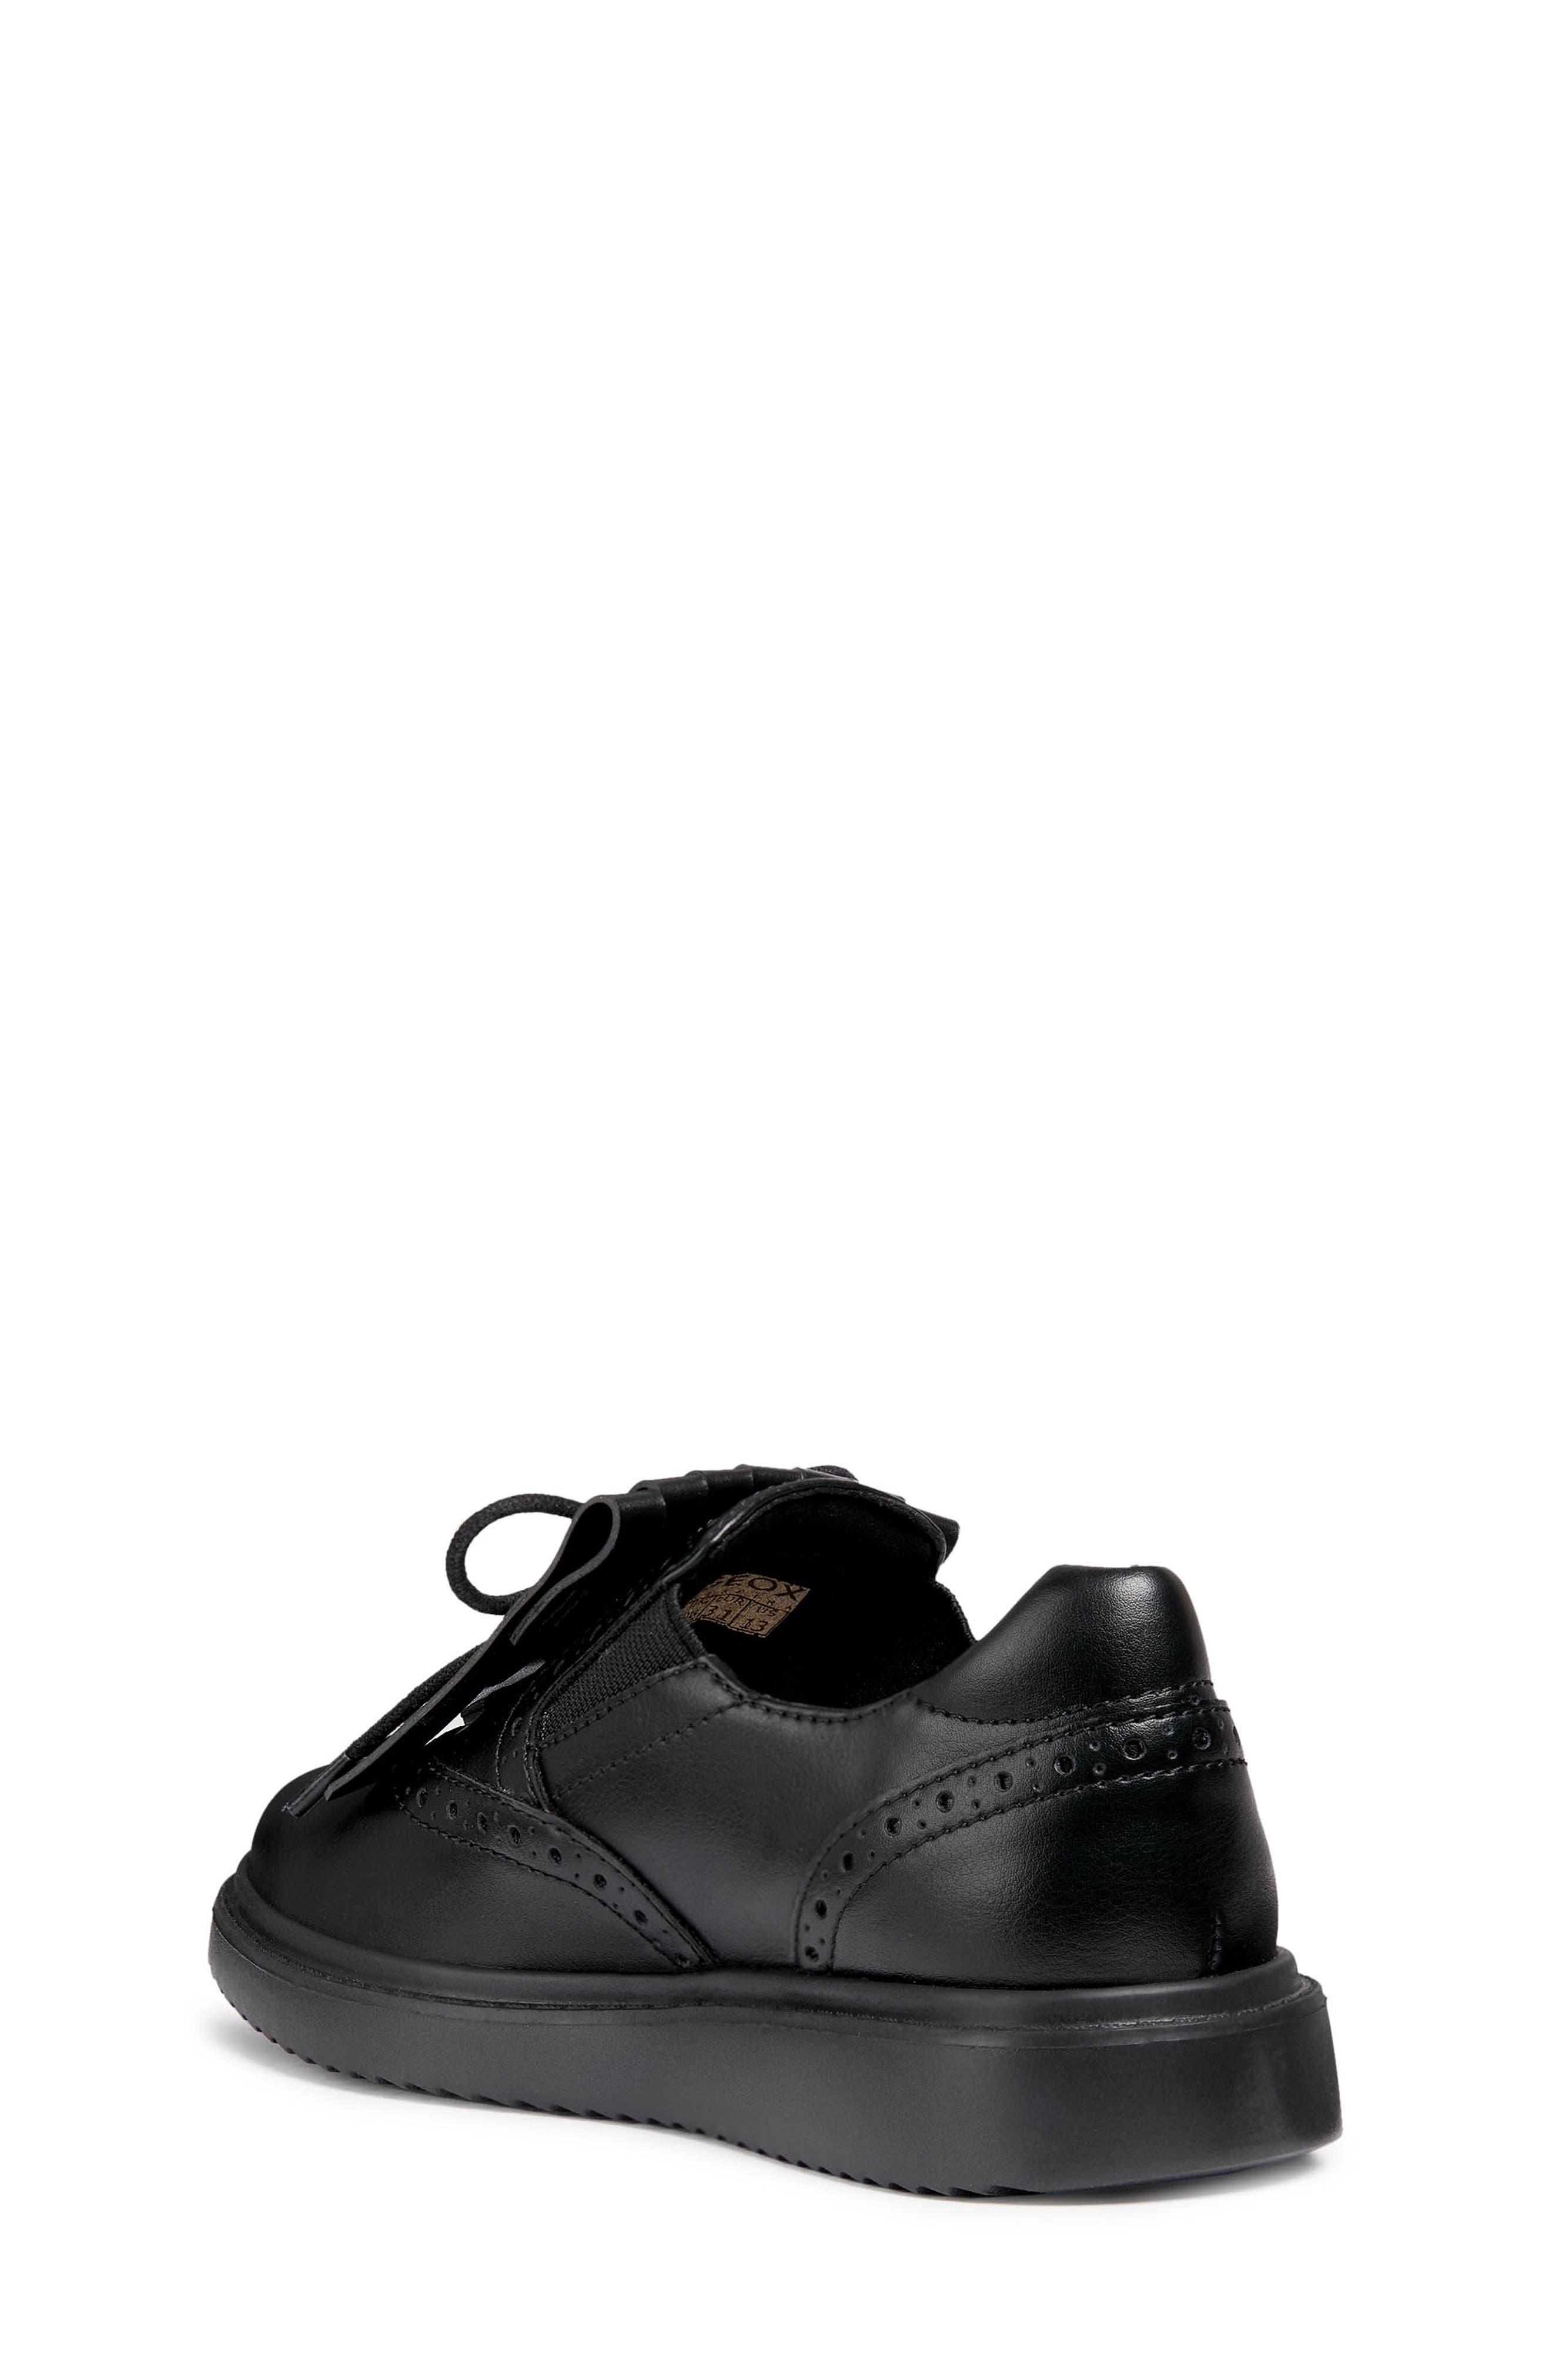 GEOX,                             Thymar Kiltie Fringe Sneaker,                             Alternate thumbnail 2, color,                             001